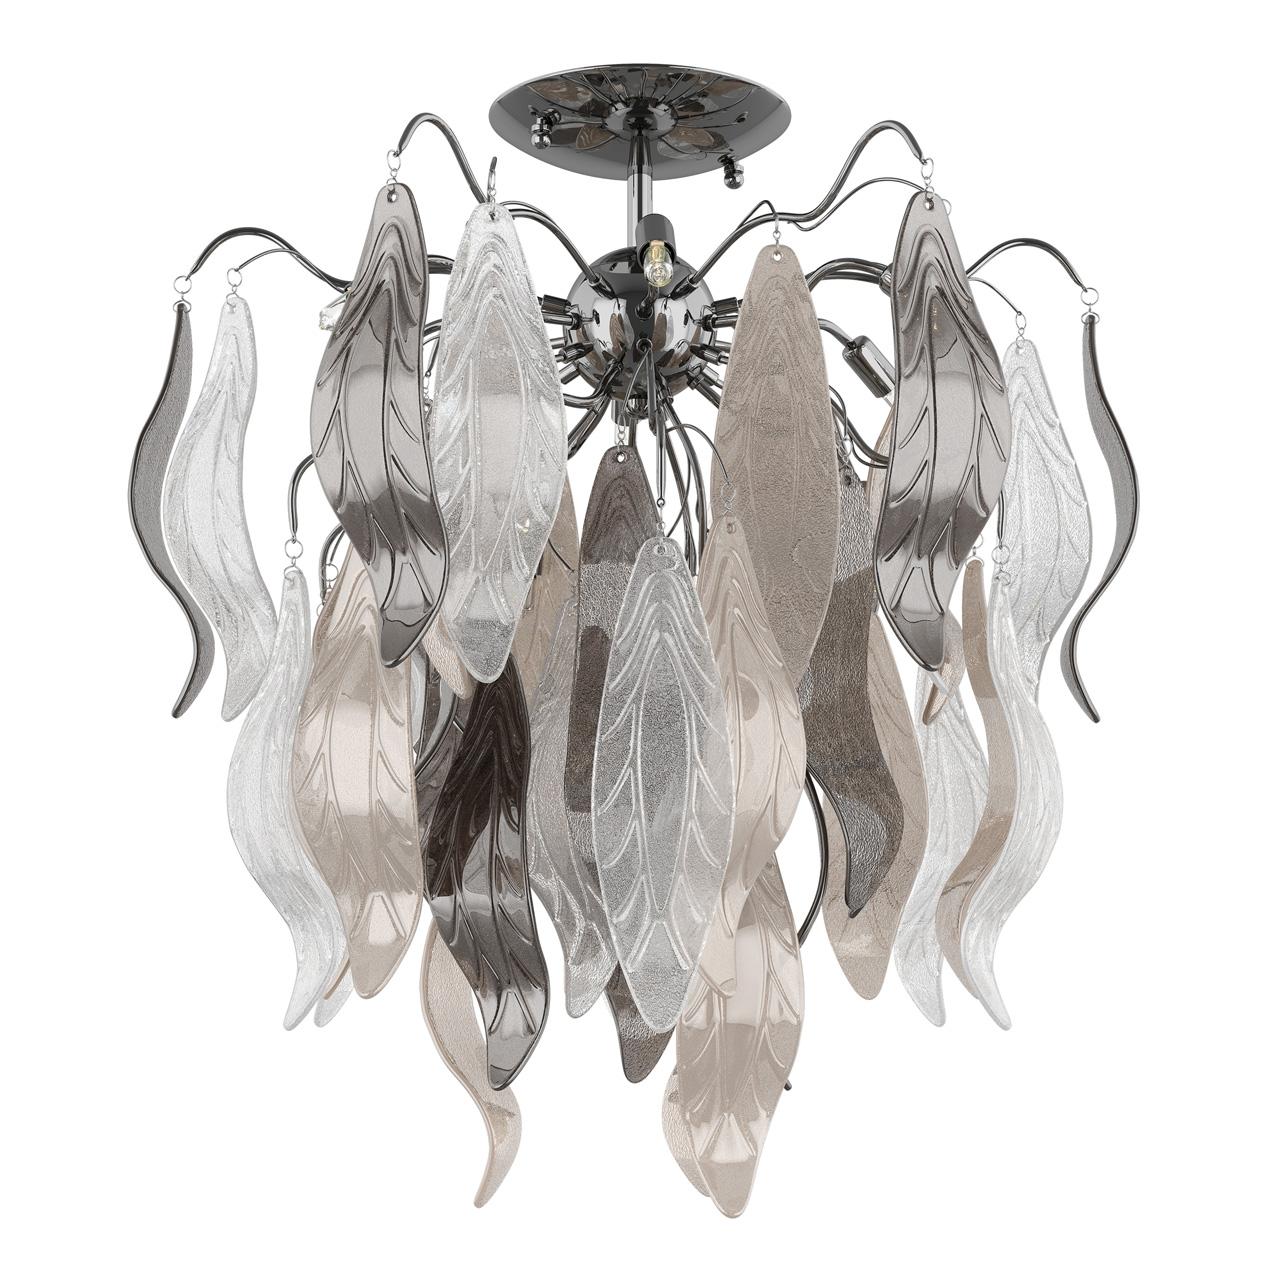 Потолочный светильник Lightstar, G9 потолочная люстра lightstar vetro сristallo 793094